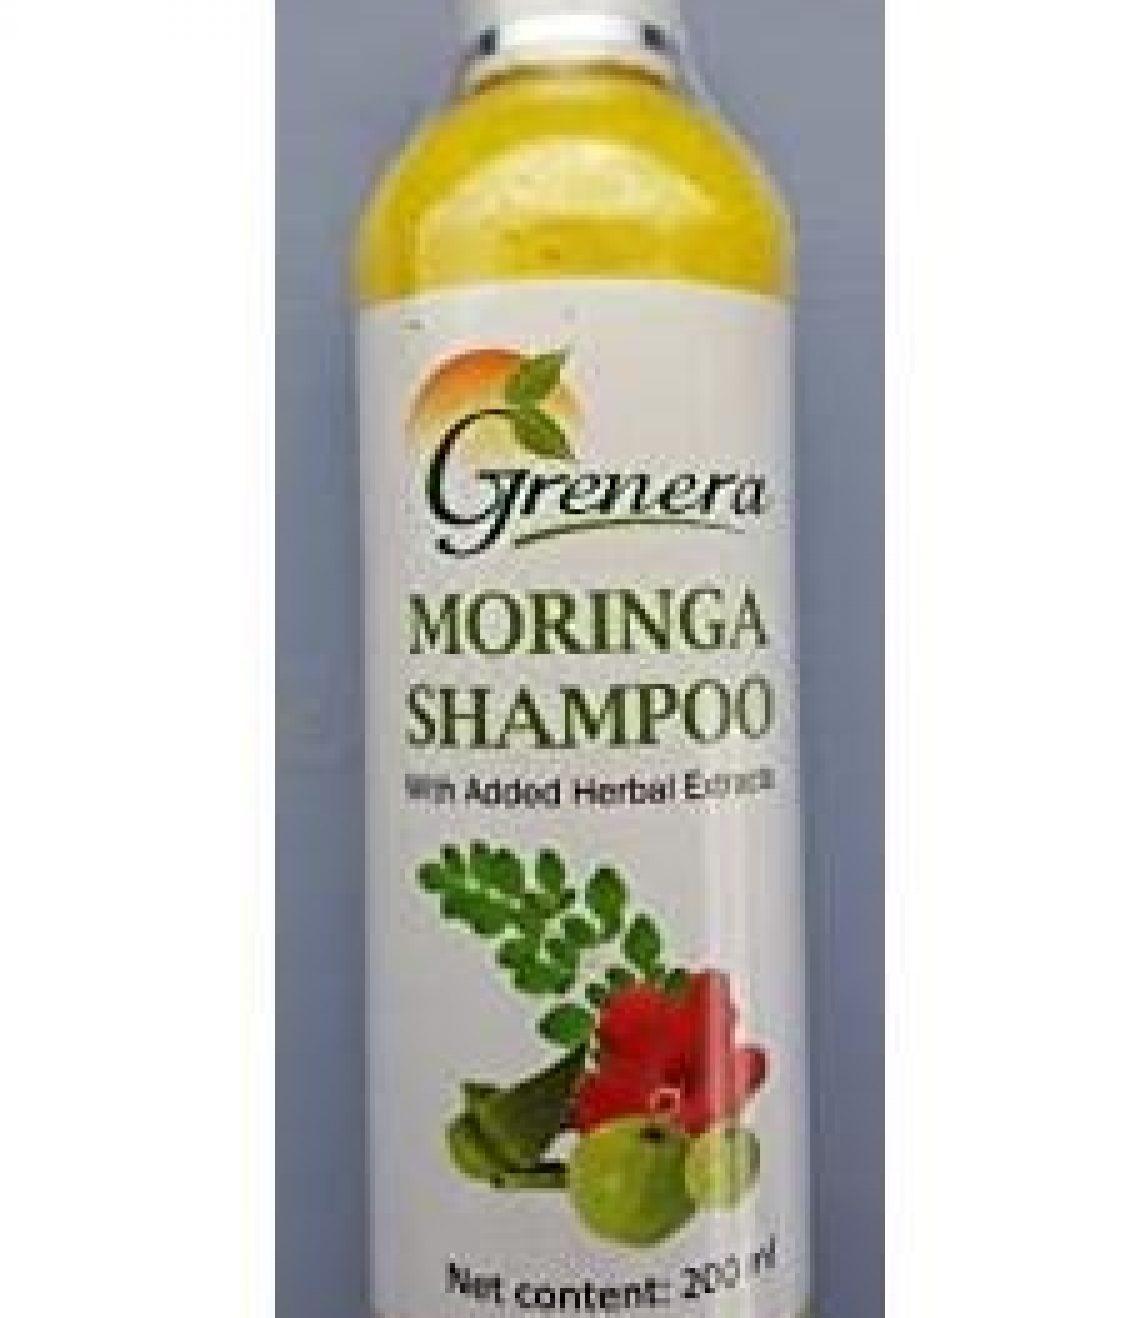 Grenera moringa shampoo